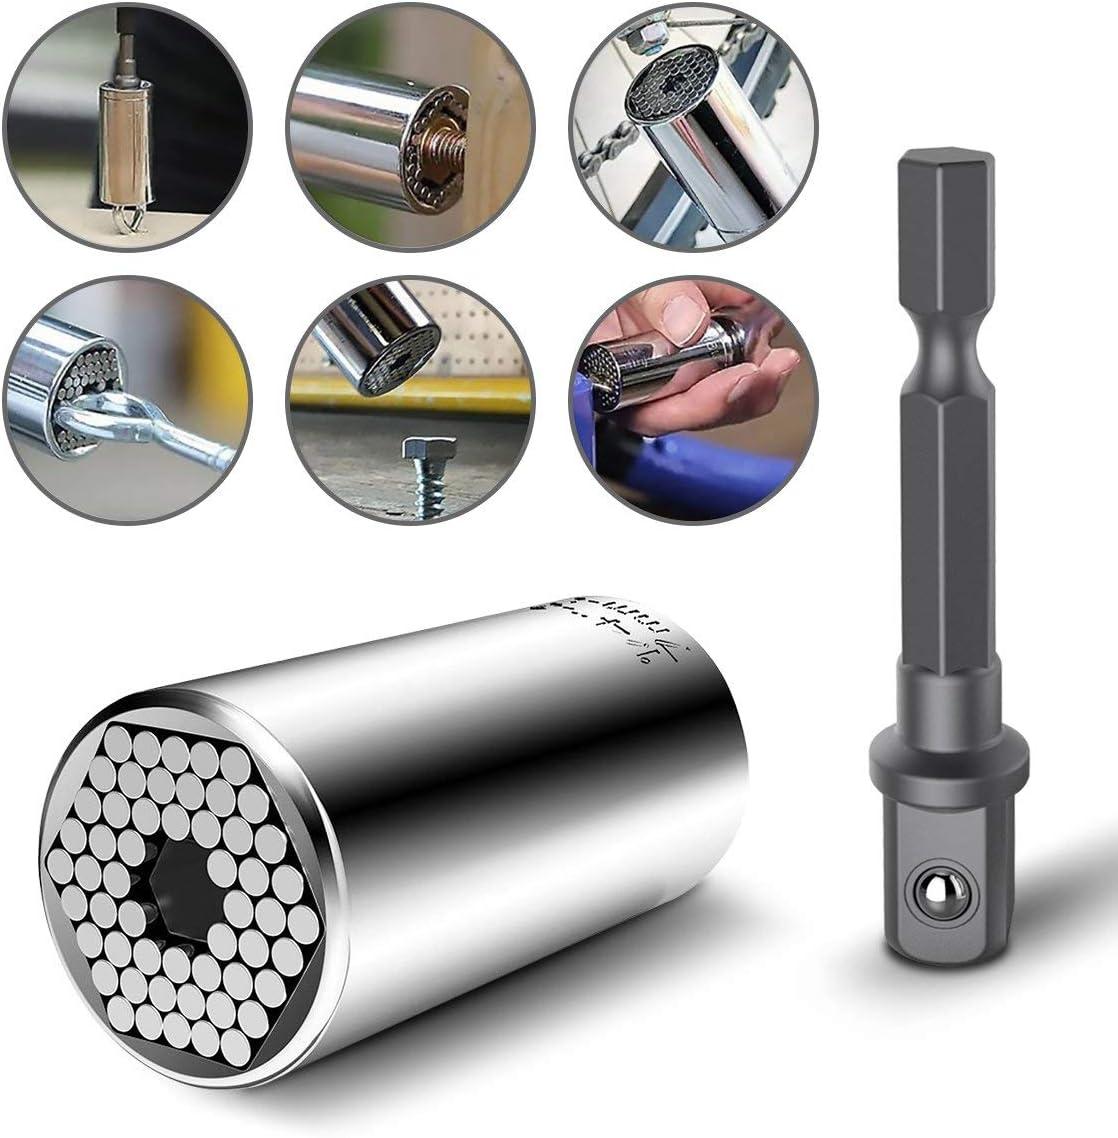 CIGOTU Universal Socket Impact Grade Driver Sockets Adapter Extension Set Screwdriver Set Hex Bit 7mm-19mm Multifunctional Cordless Ratchet Adapter Socket Wrench Set 105 Degree Right Angle Drill